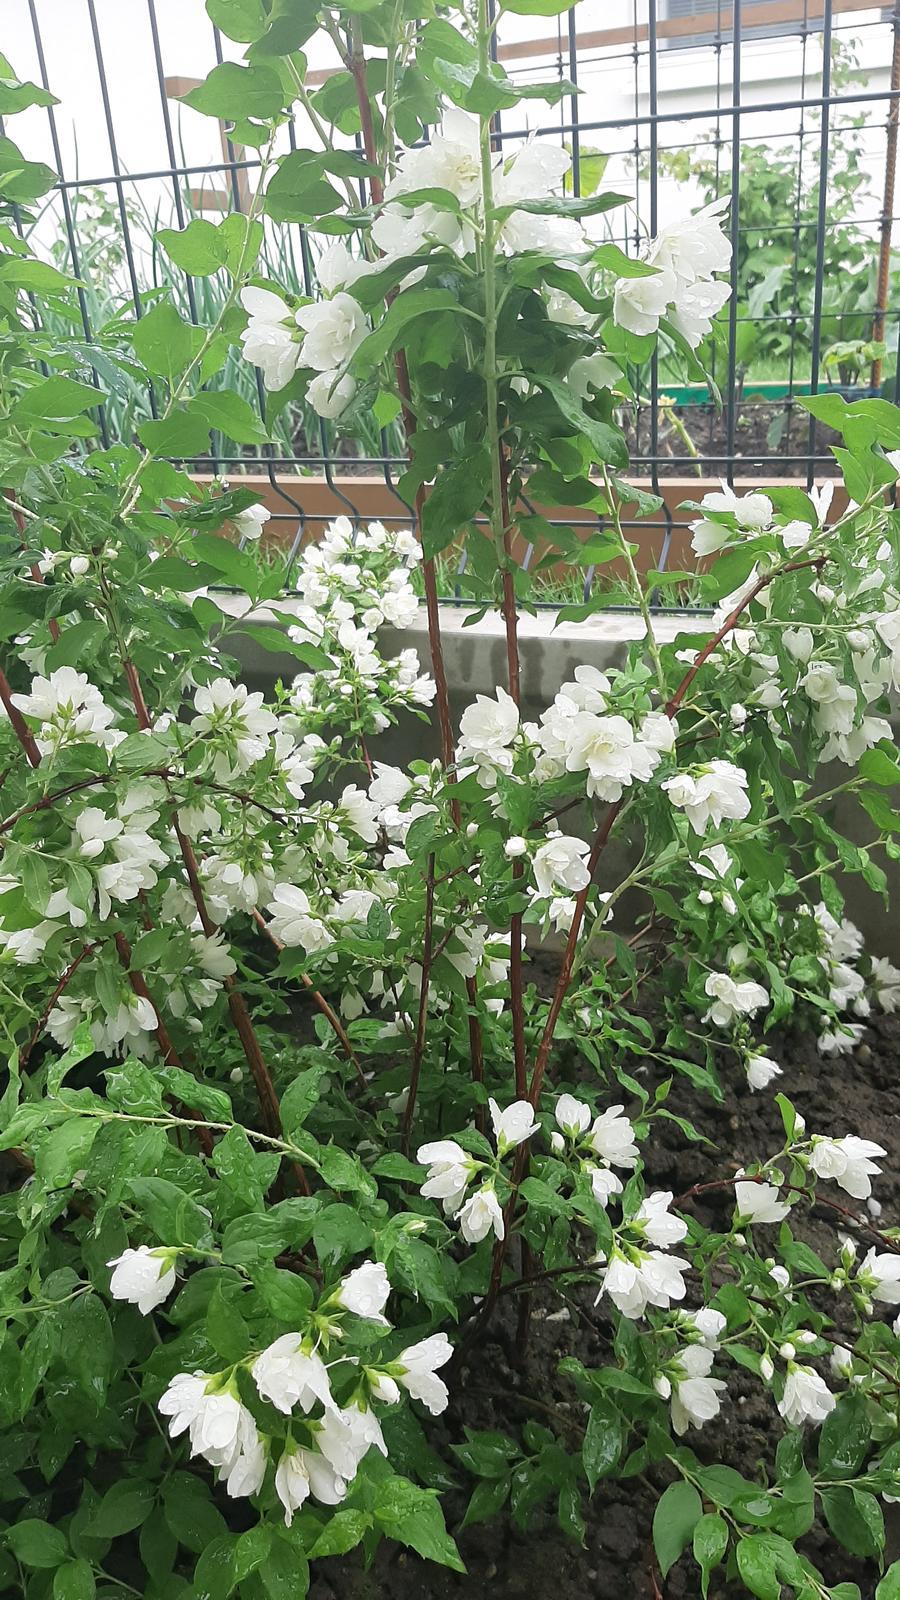 🏠🌞🌺❤🌷 Zahrada a jej dalsi rok...2020 🌱🐞🐛🦋🍓🥕🍅🌺❤ - Pajazmin brutalne vonia.